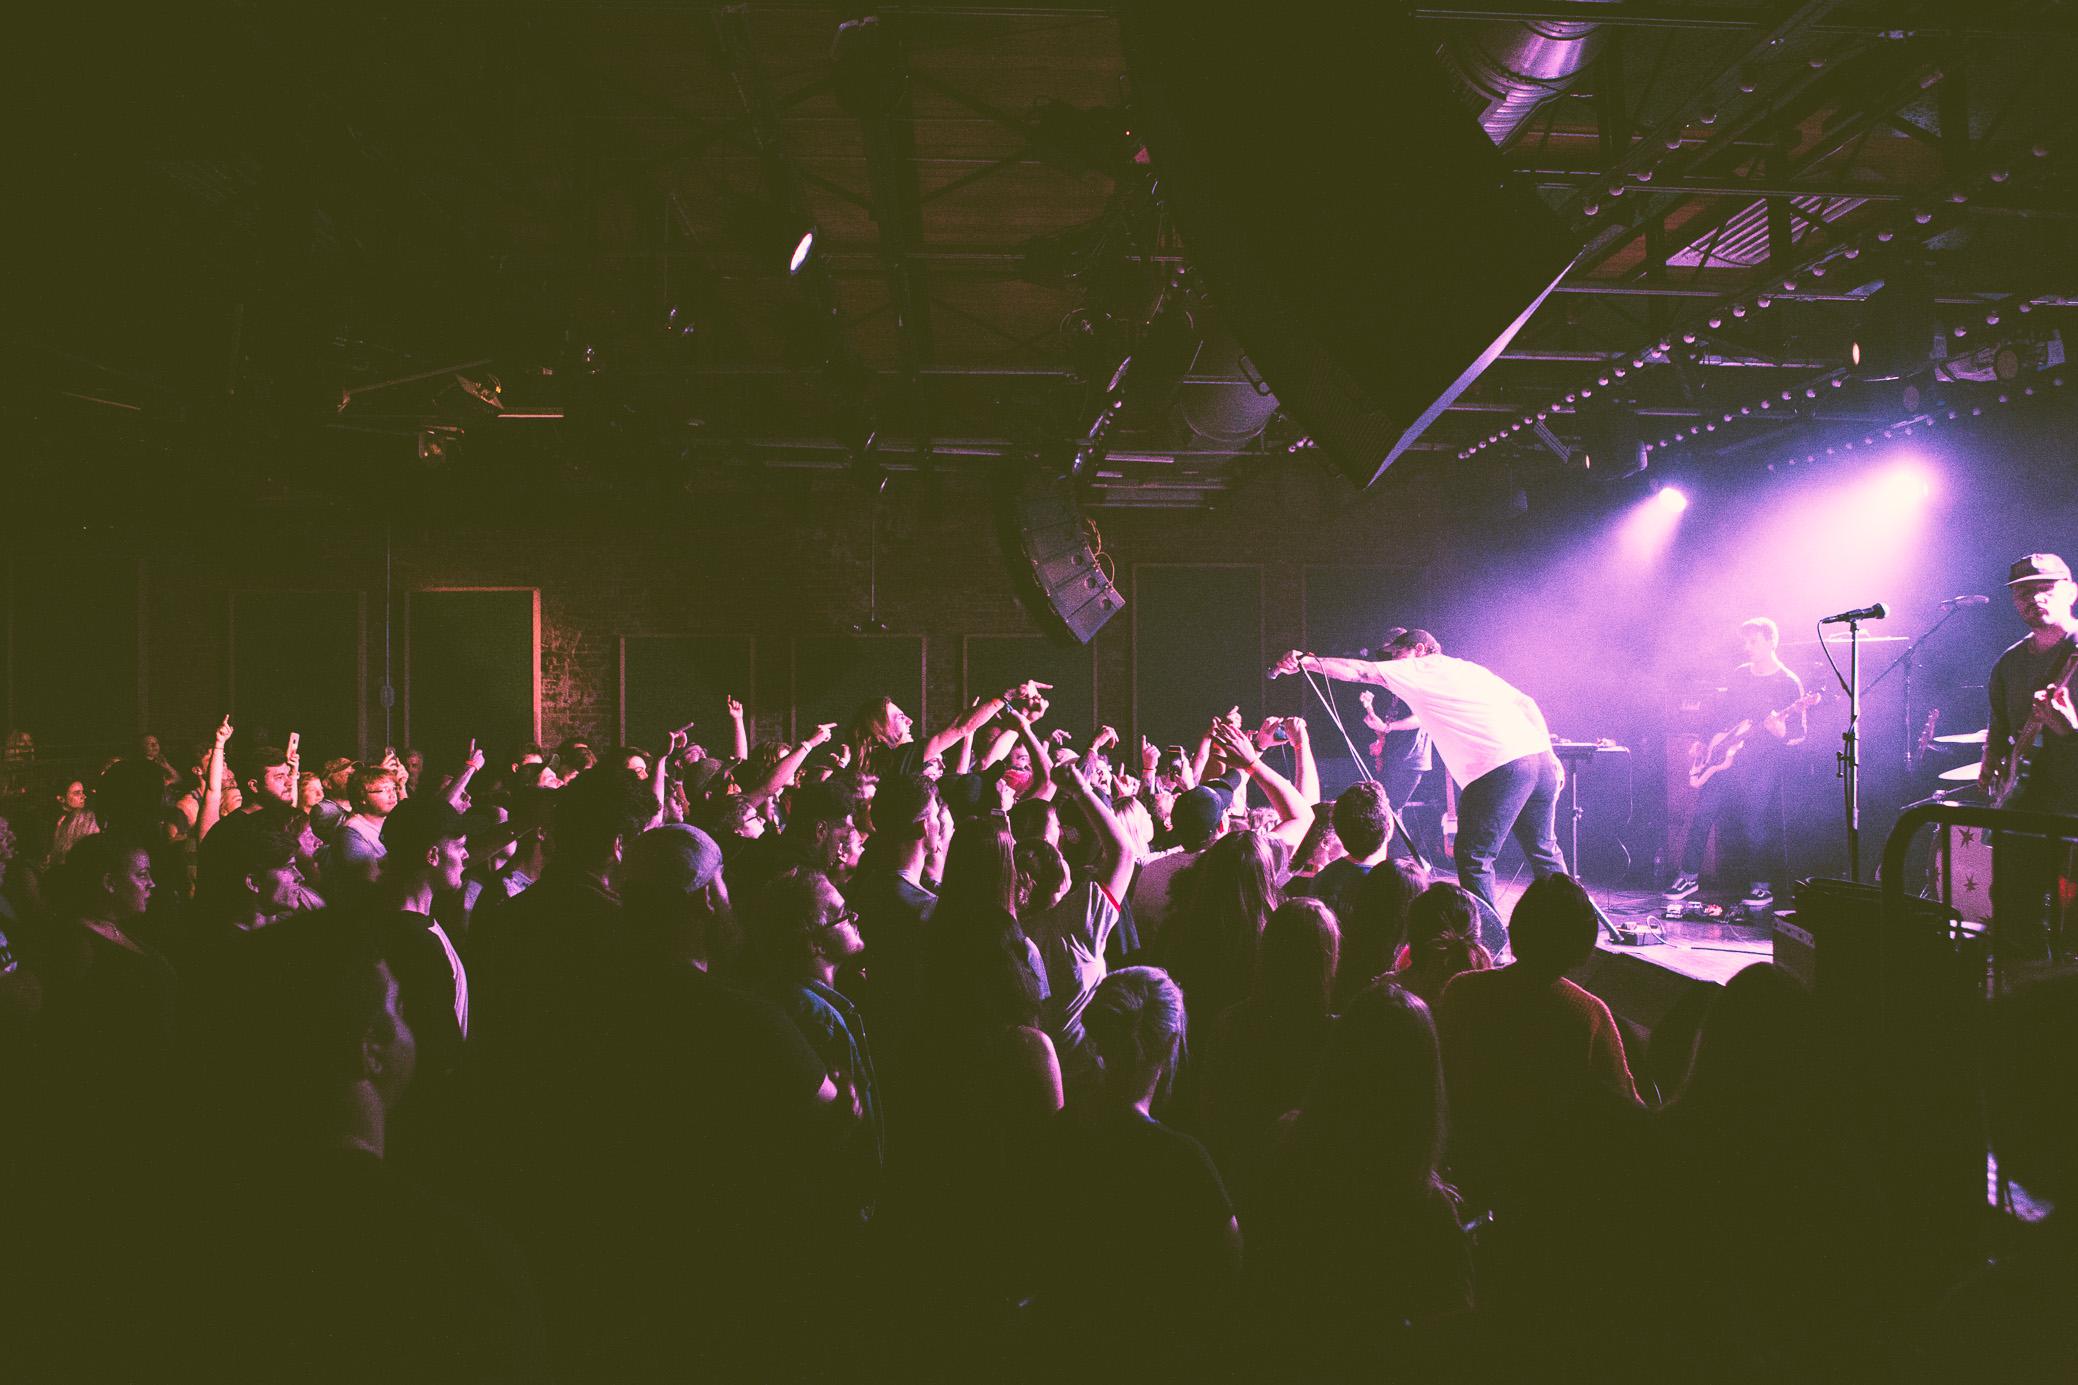 Matt Kerekes of Citizen performs in concert at Saturn Birmingham in Birmingham, Alabama on May 7th, 2018. (Photo by David A. Smith/DSmithScenes)